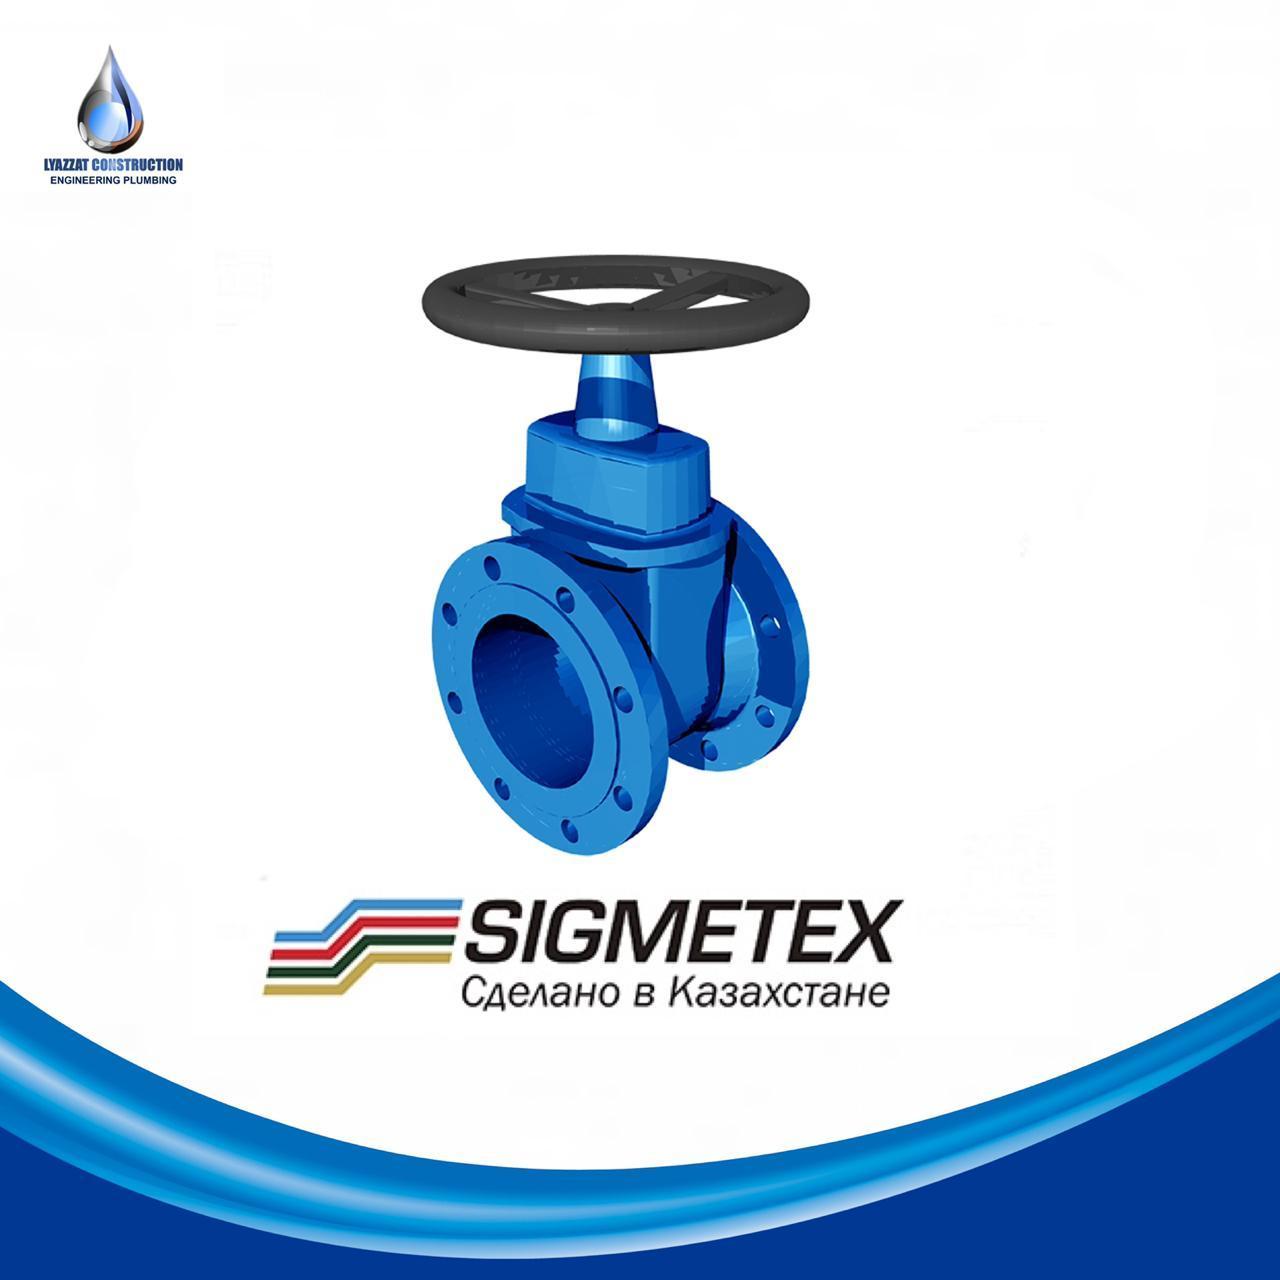 Задвижка Sigmetex DN 100 (Сигметэкс)